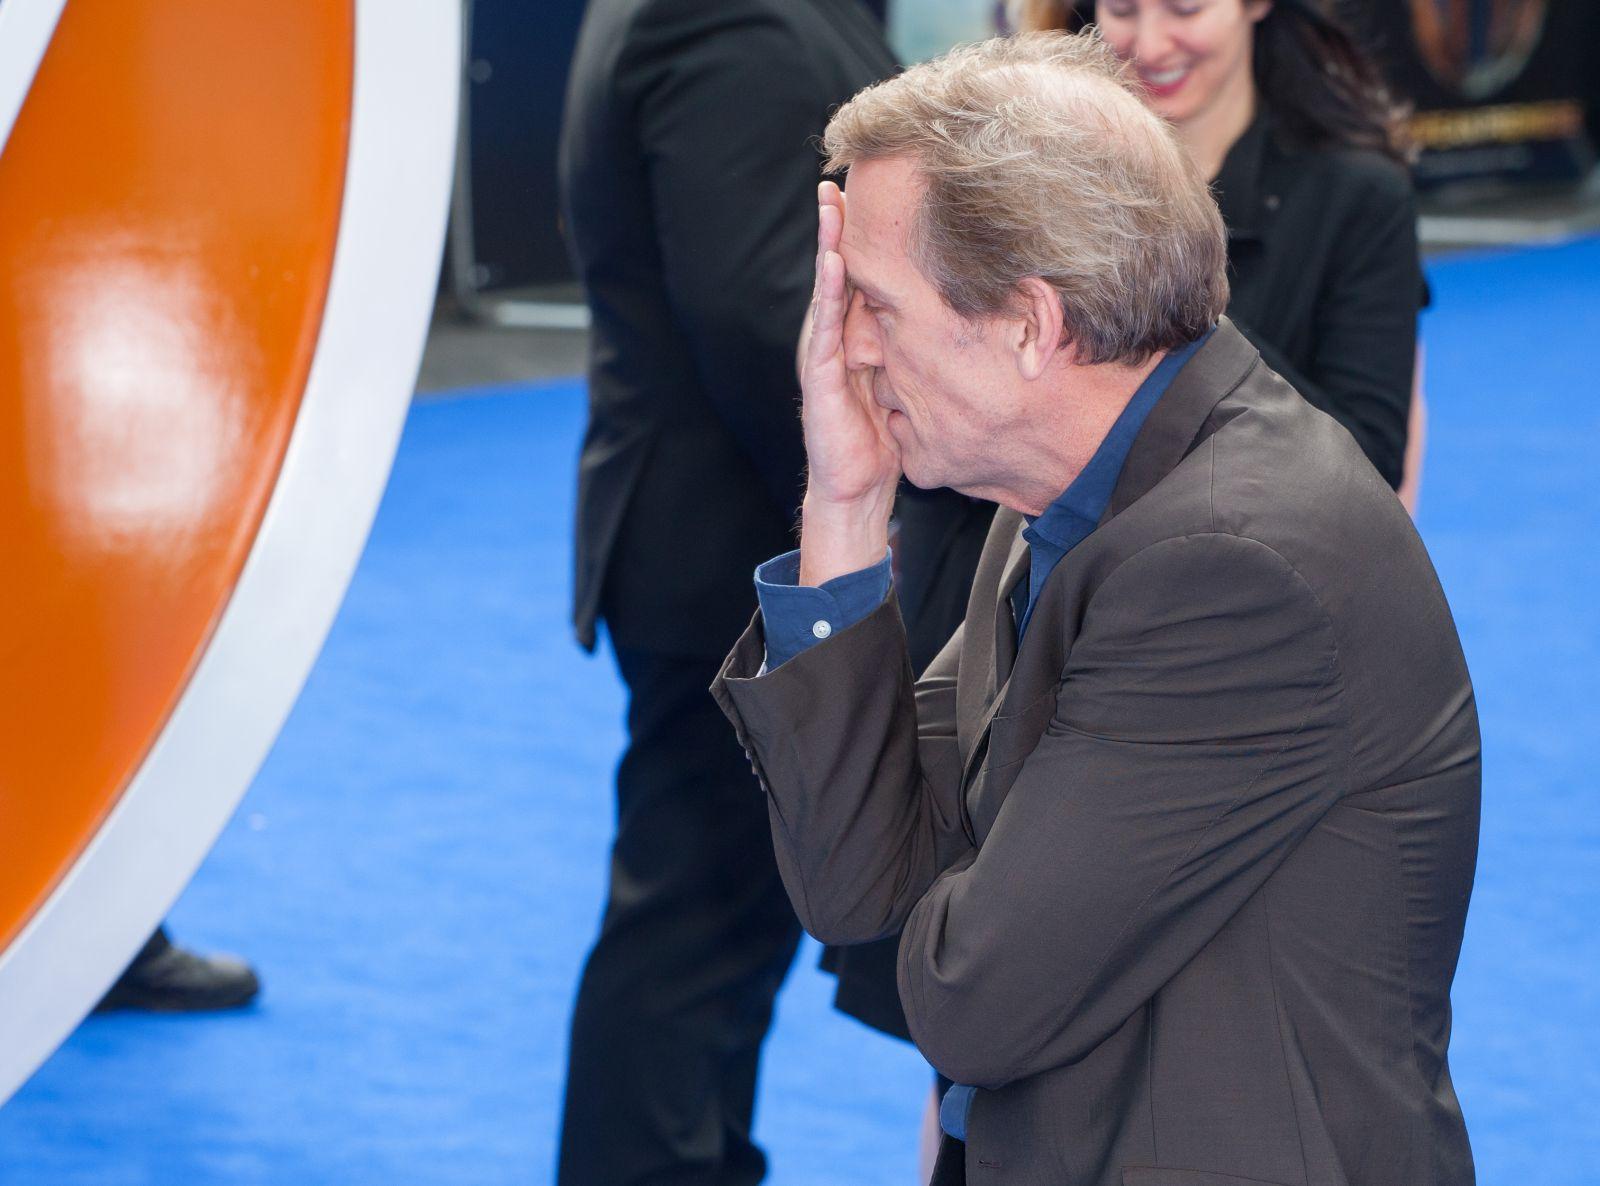 Hugh Laurie7 - Tomorrowland Premiere London 2015.jpg